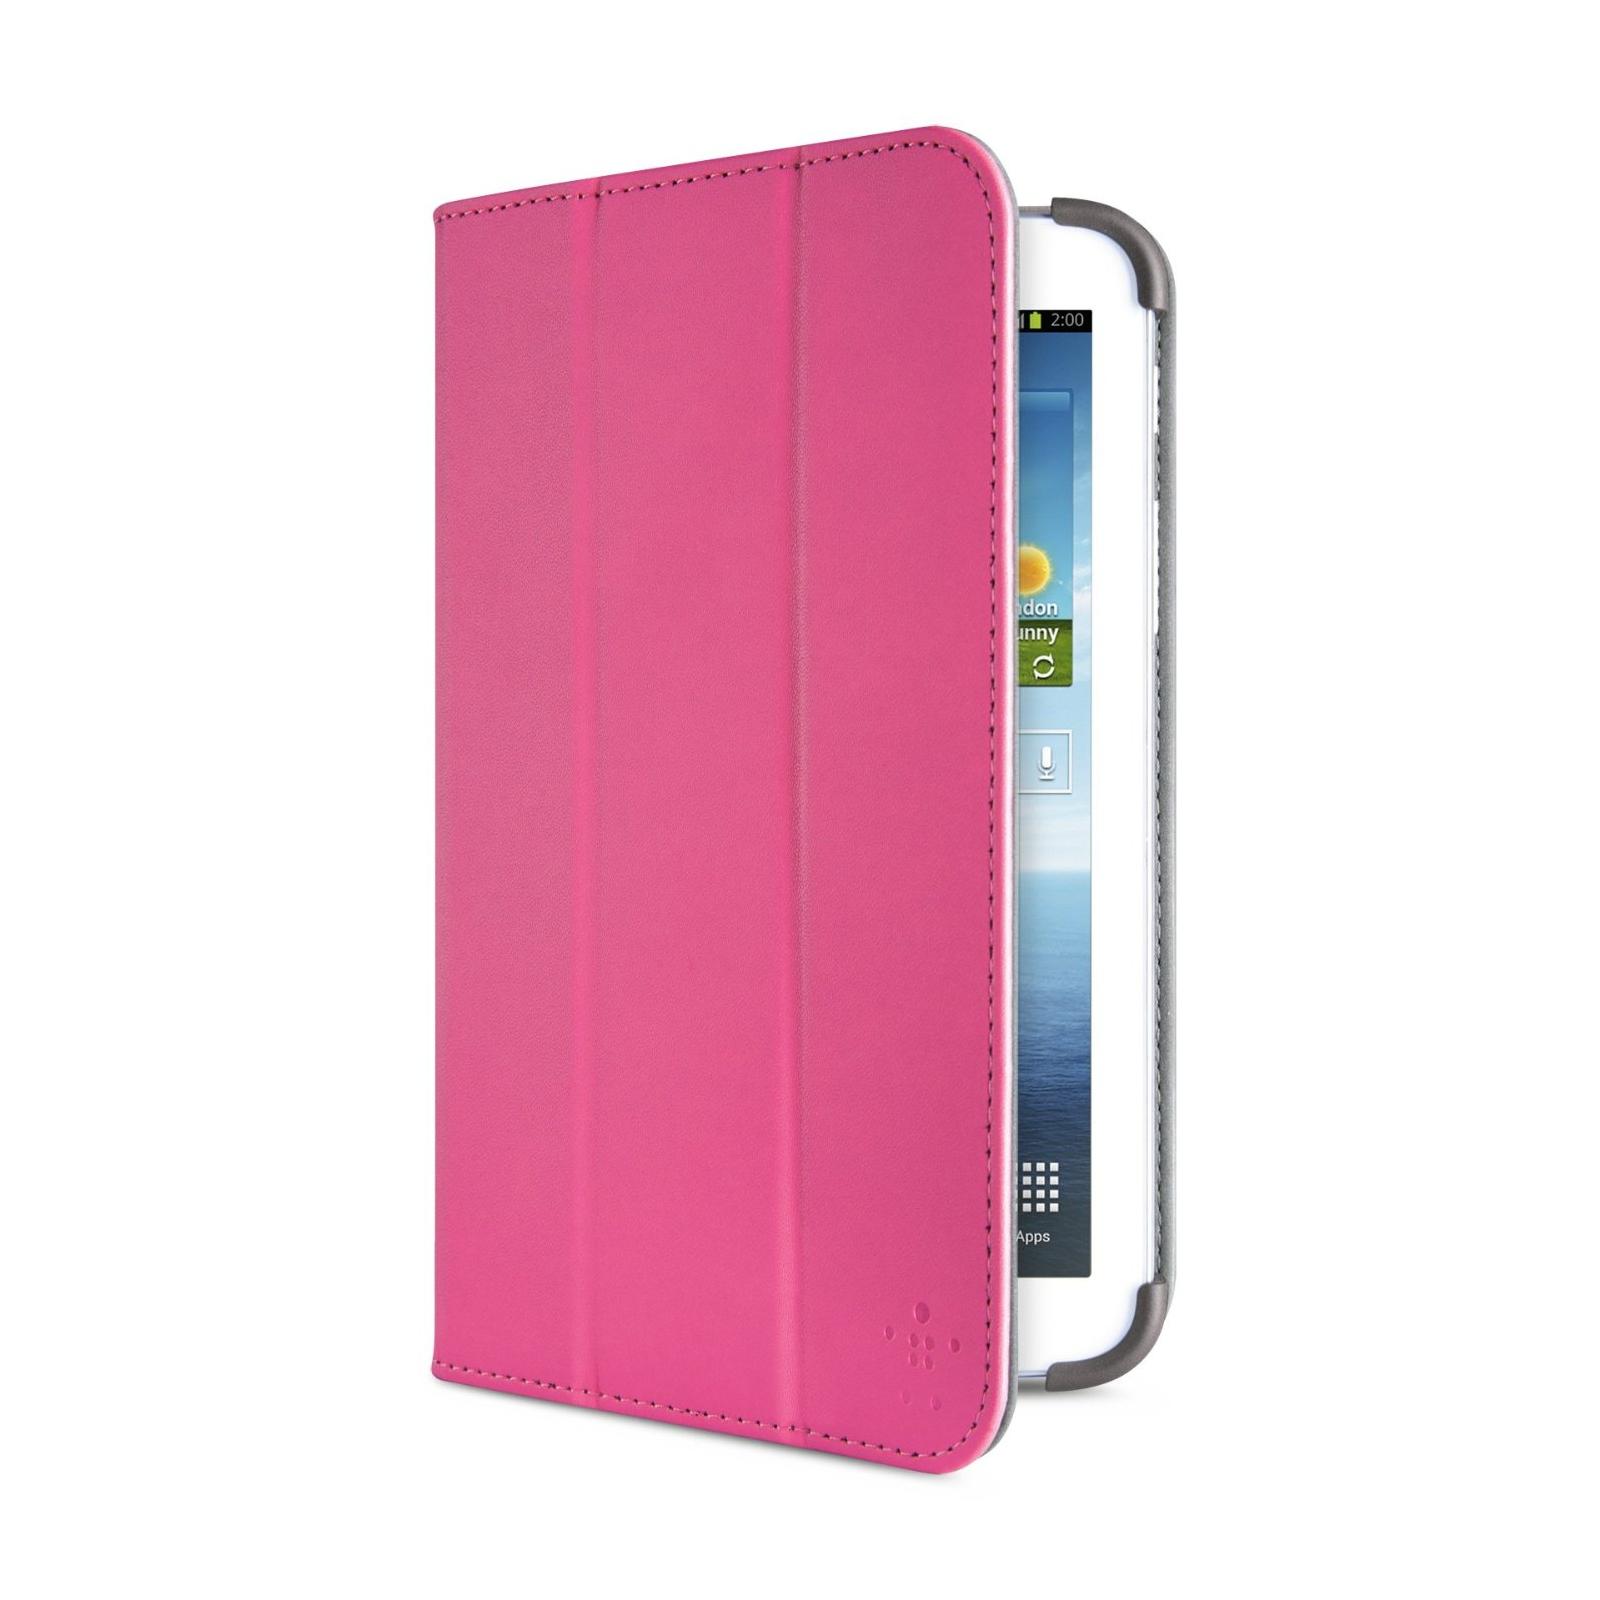 Чехол для планшета Belkin 7 GalaxyTab3 Tri-Fold Cover Stand/pink (F7P120vfC02) изображение 2